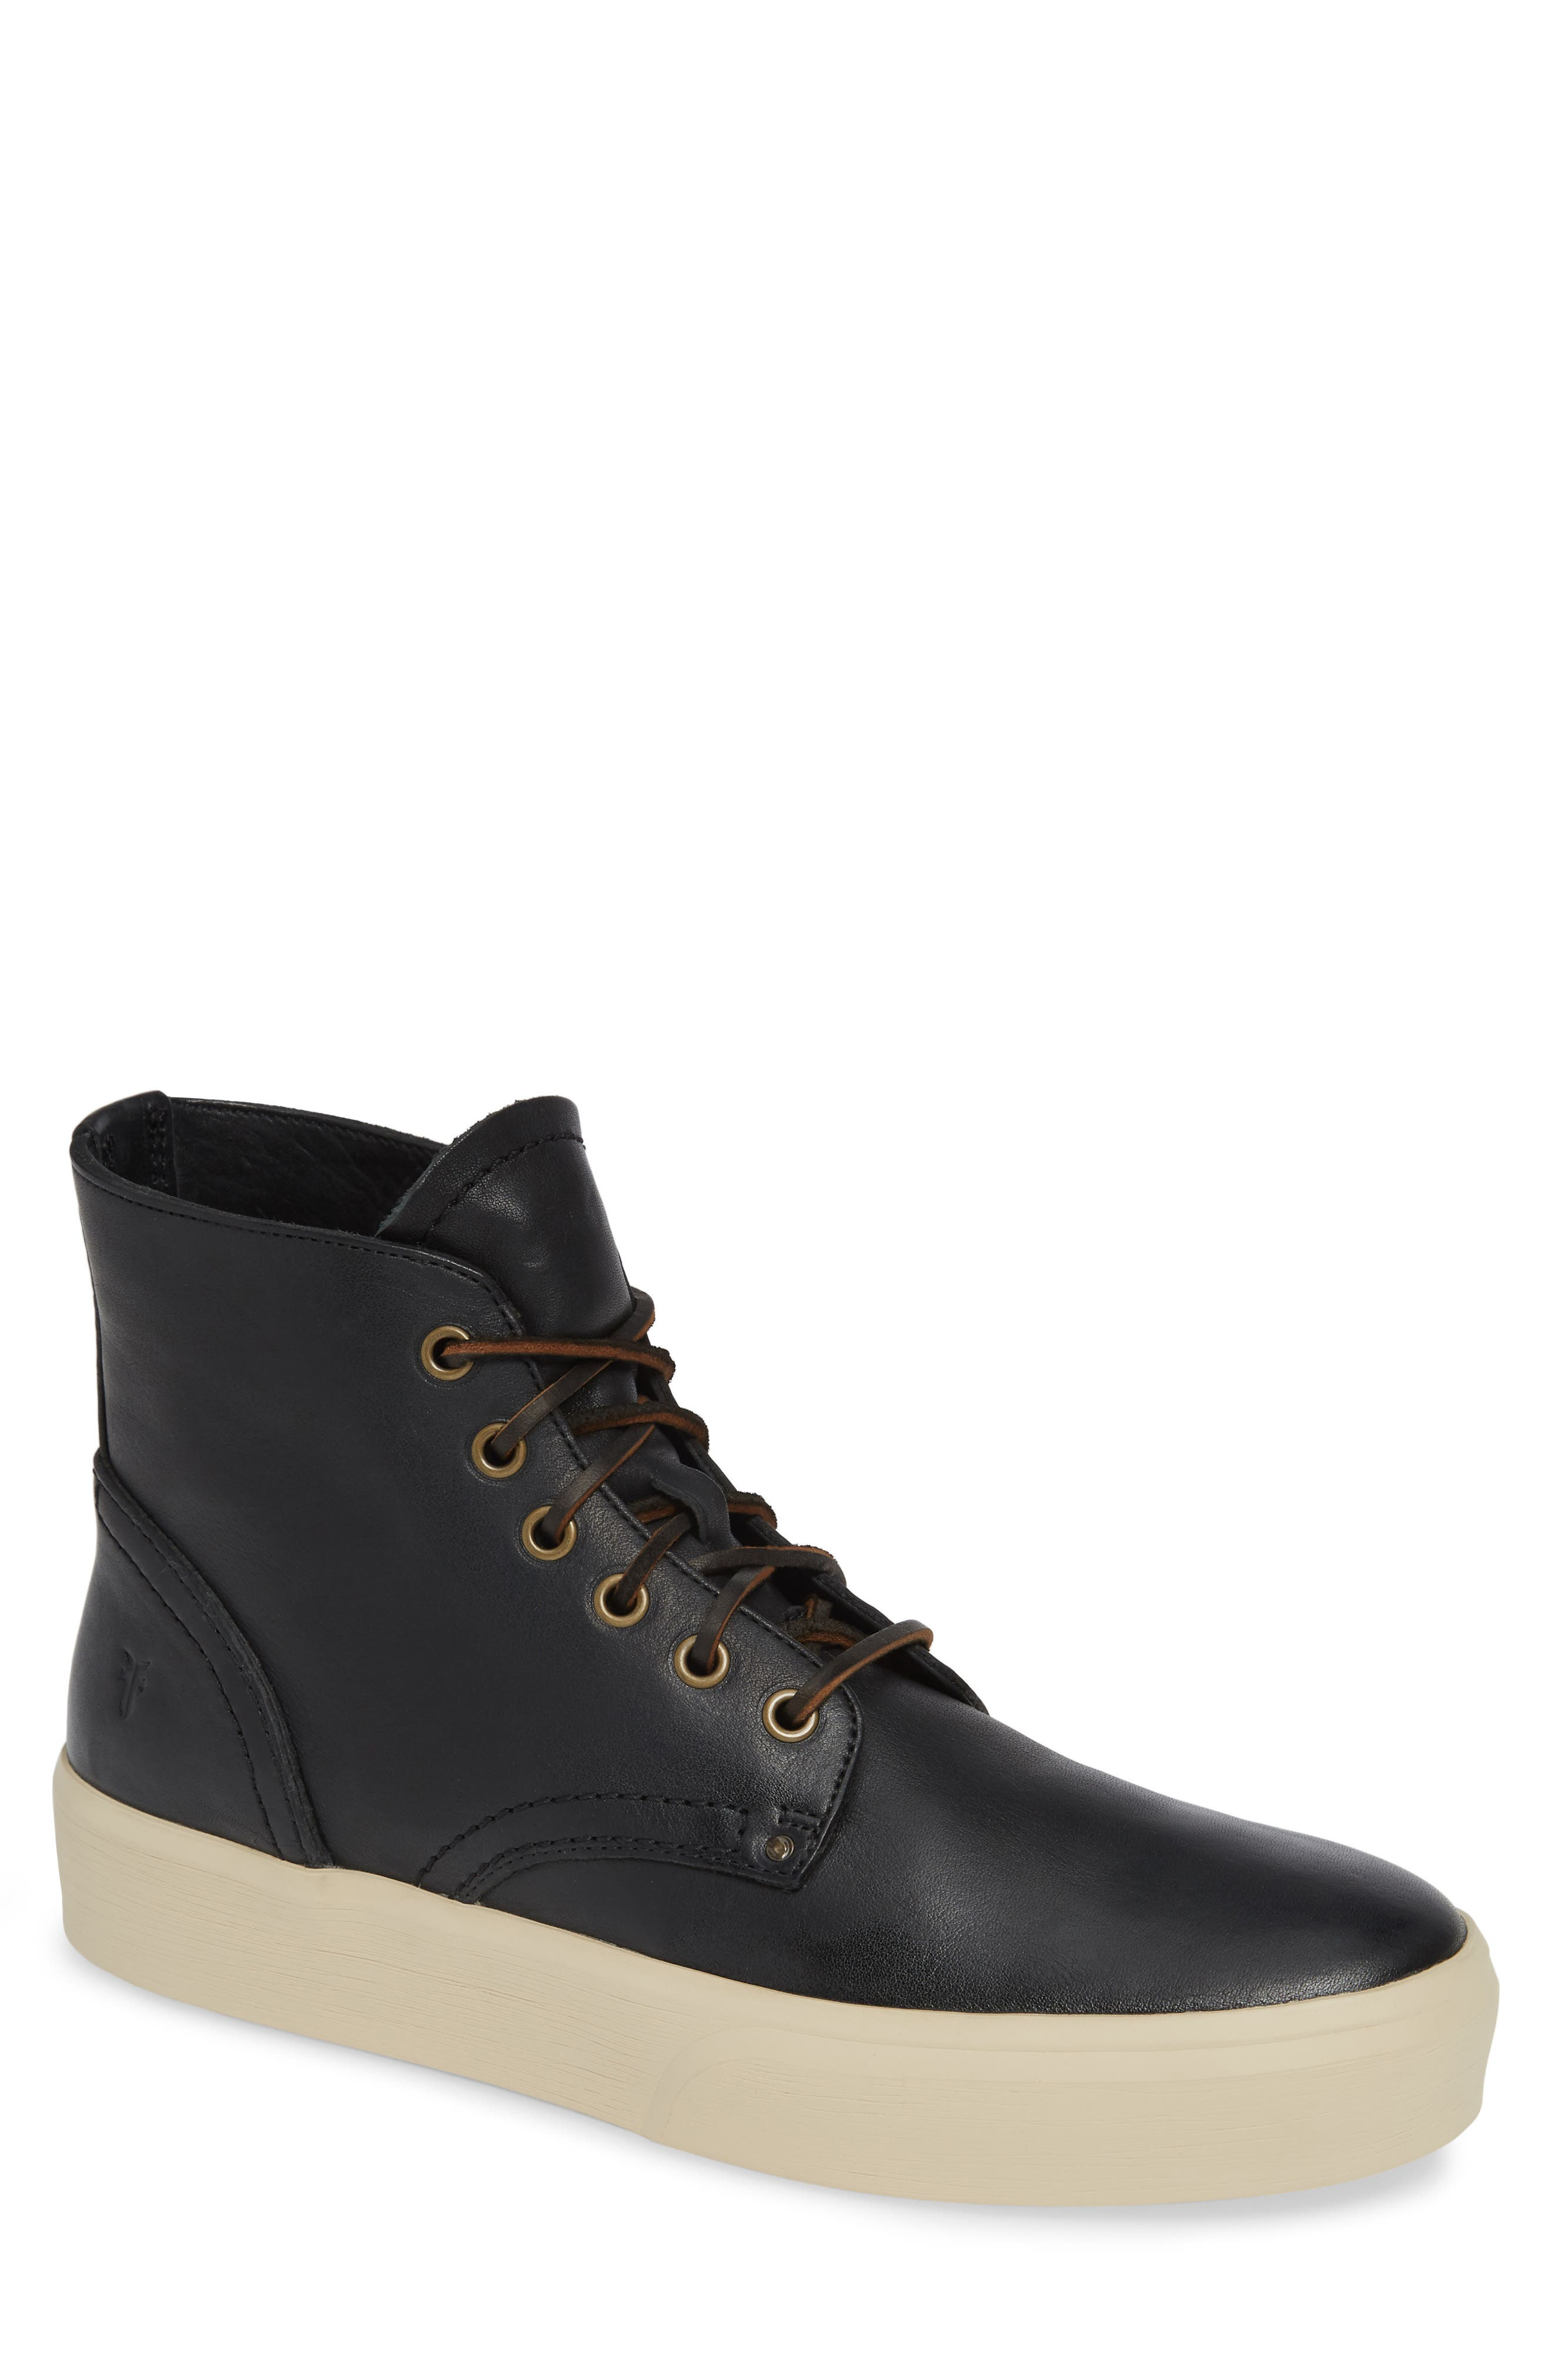 Beacon High Top Platform Sneaker,                         Main,                         color, BLACK